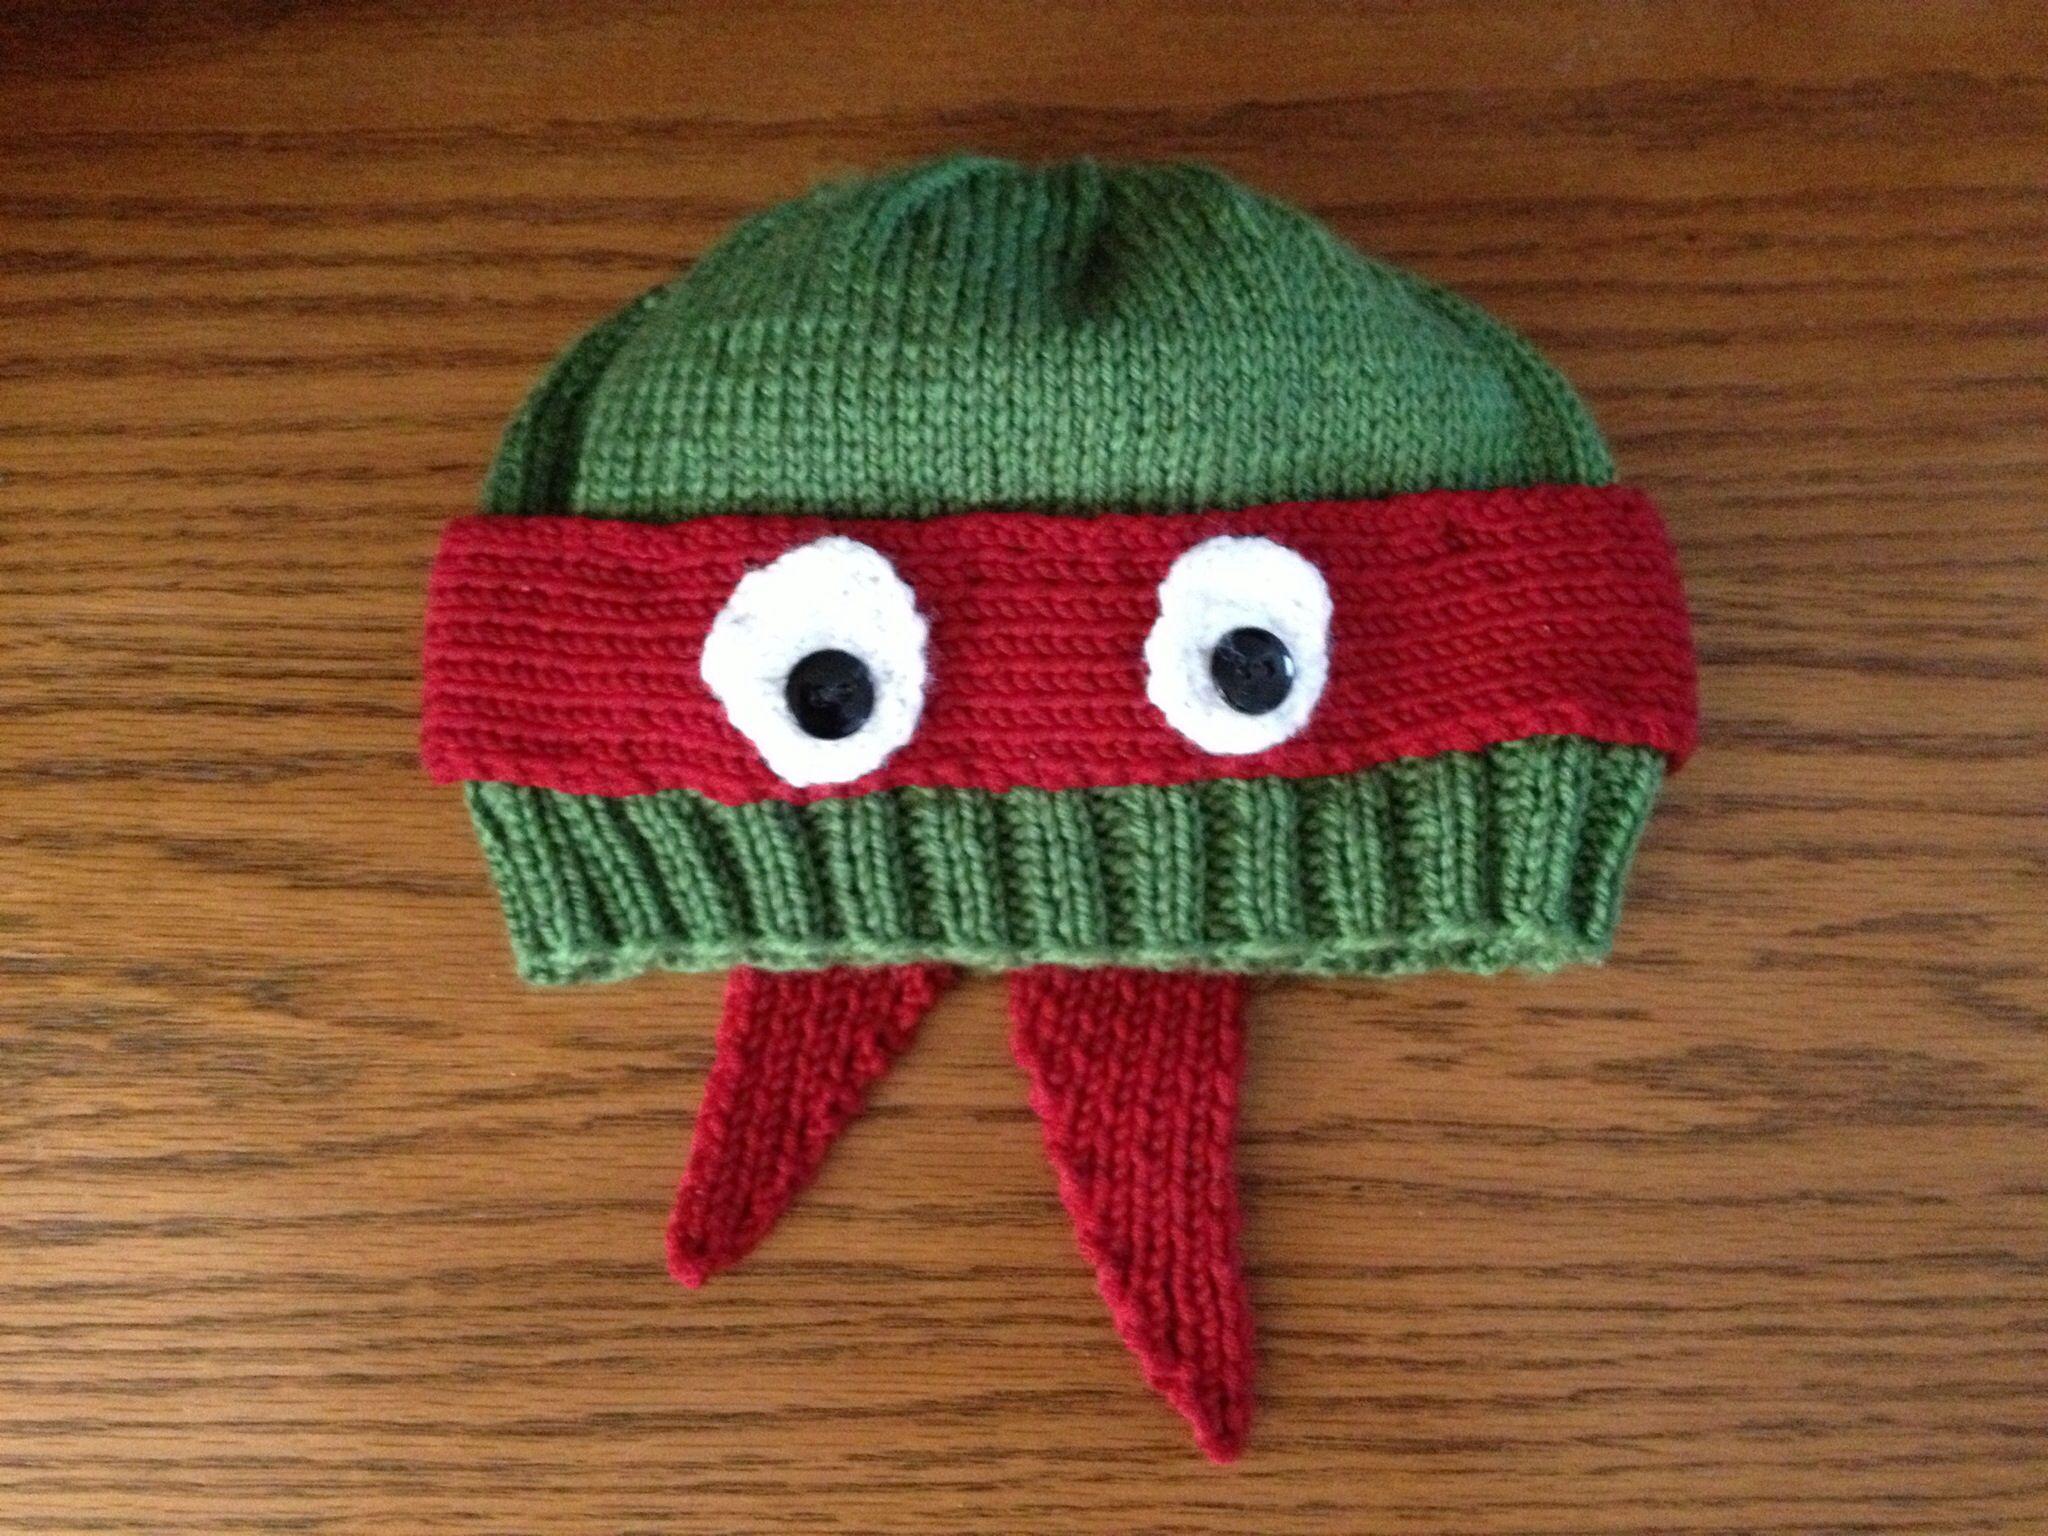 Teenage Mutant Ninja Turtle Knit Hat   Free knitting   Pinterest ...